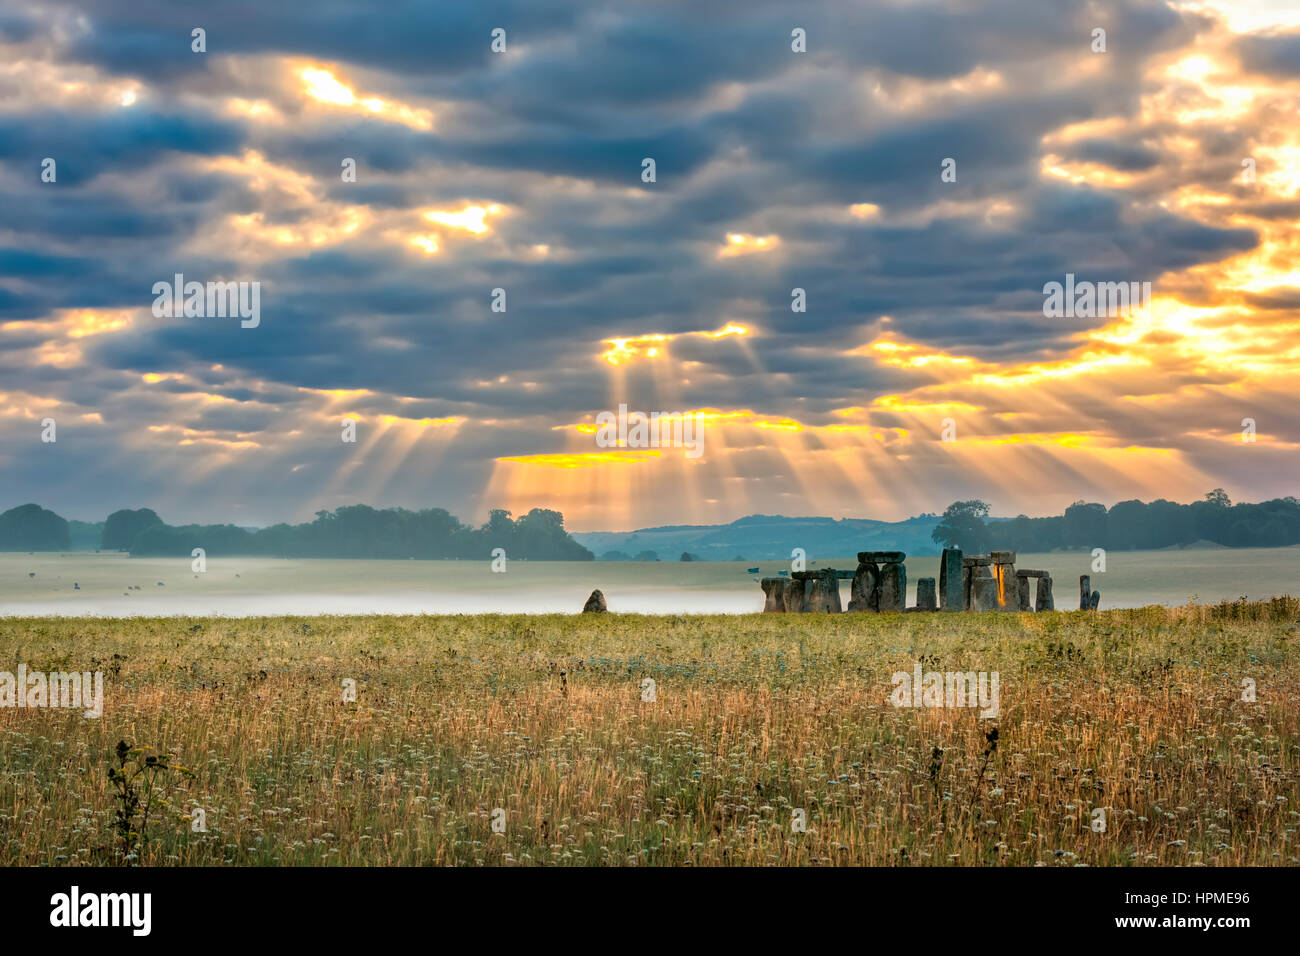 Amesbury, Wiltshire, United Kingdom - August 14, 2016: Cloudy sunrise over Stonehenge - prehistoric megalith monument Stock Photo